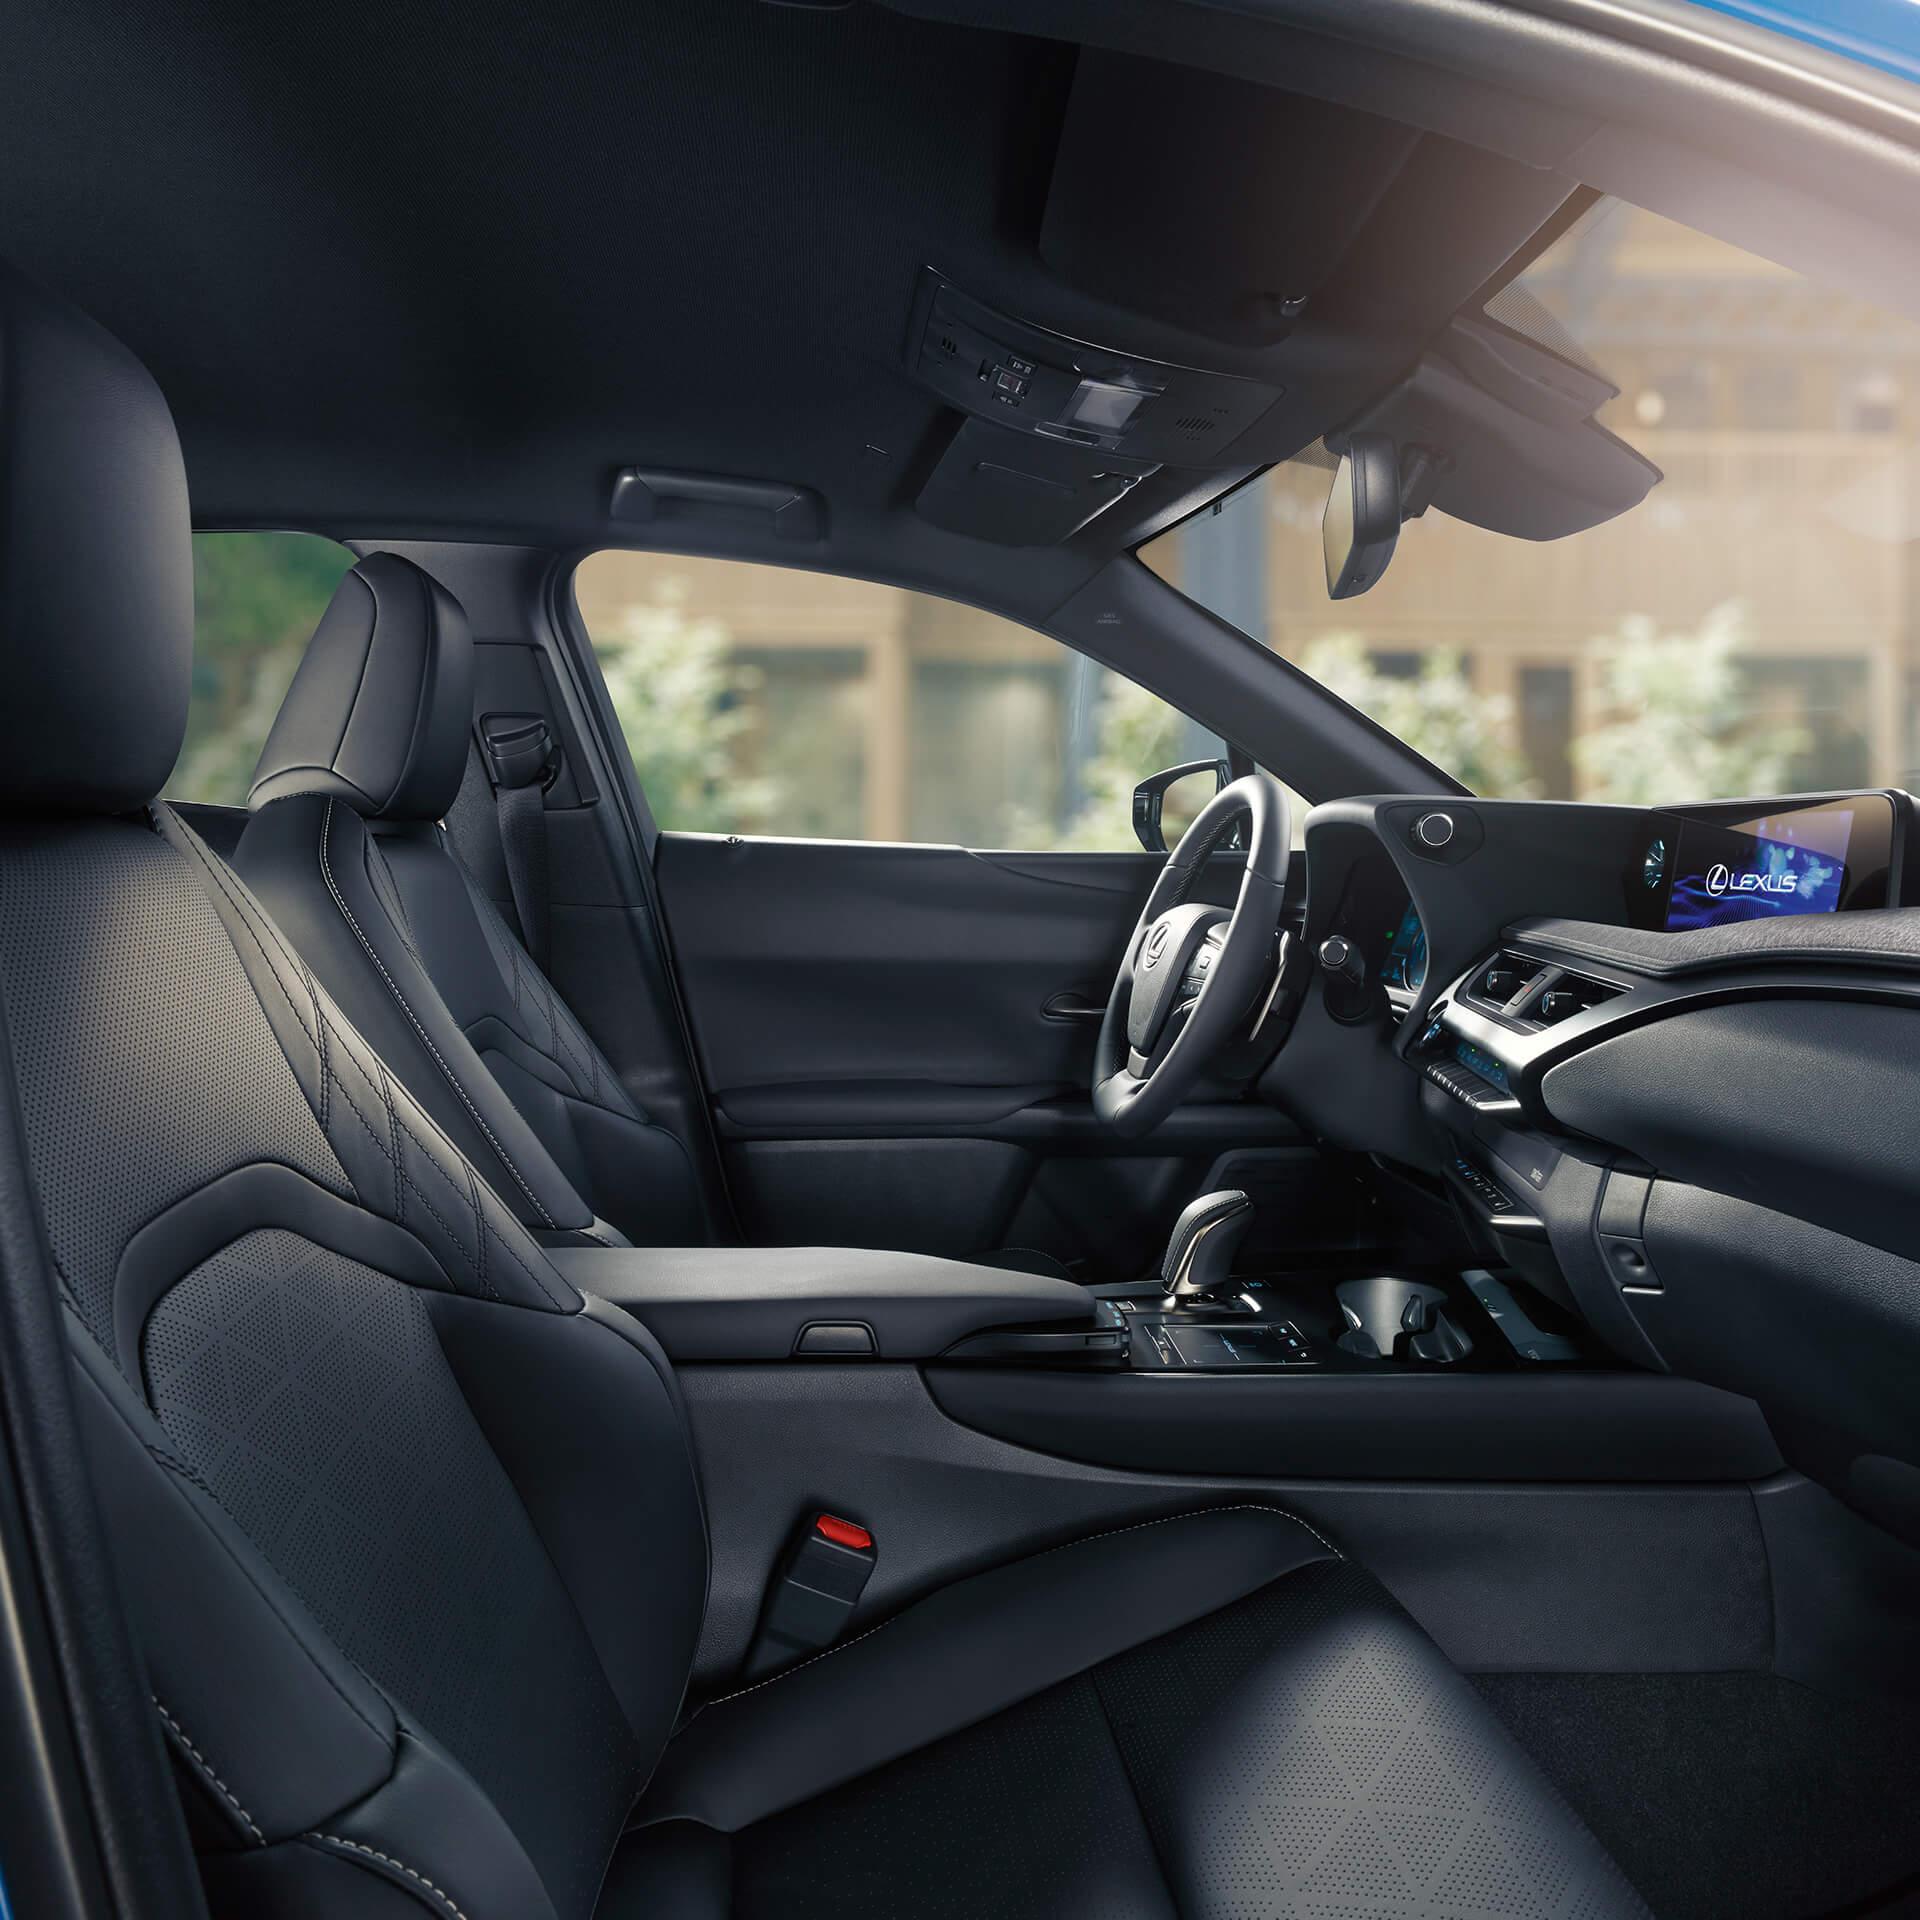 UX 300e Product Stories Promo Image